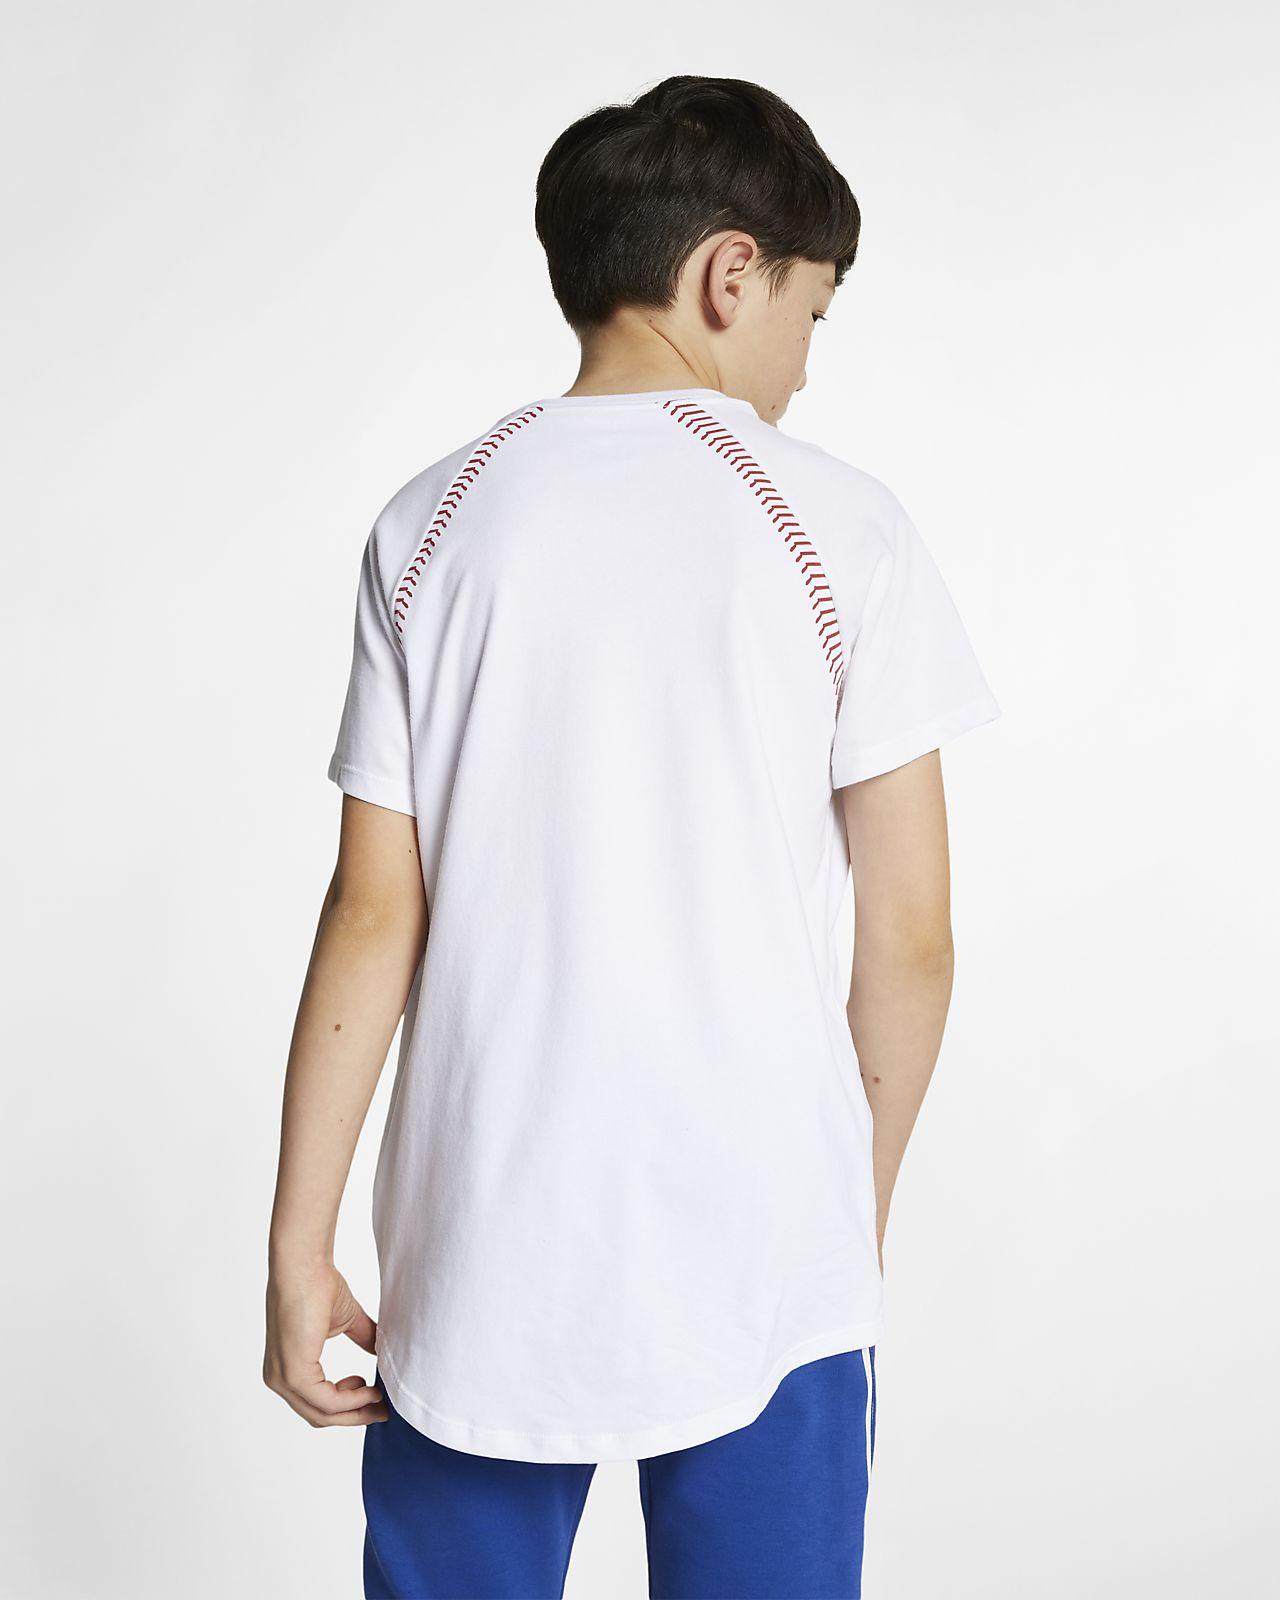 97cd6918f29c Nike Dri-FIT Big Kids  (Boys ) Training T-Shirt. Nike.com